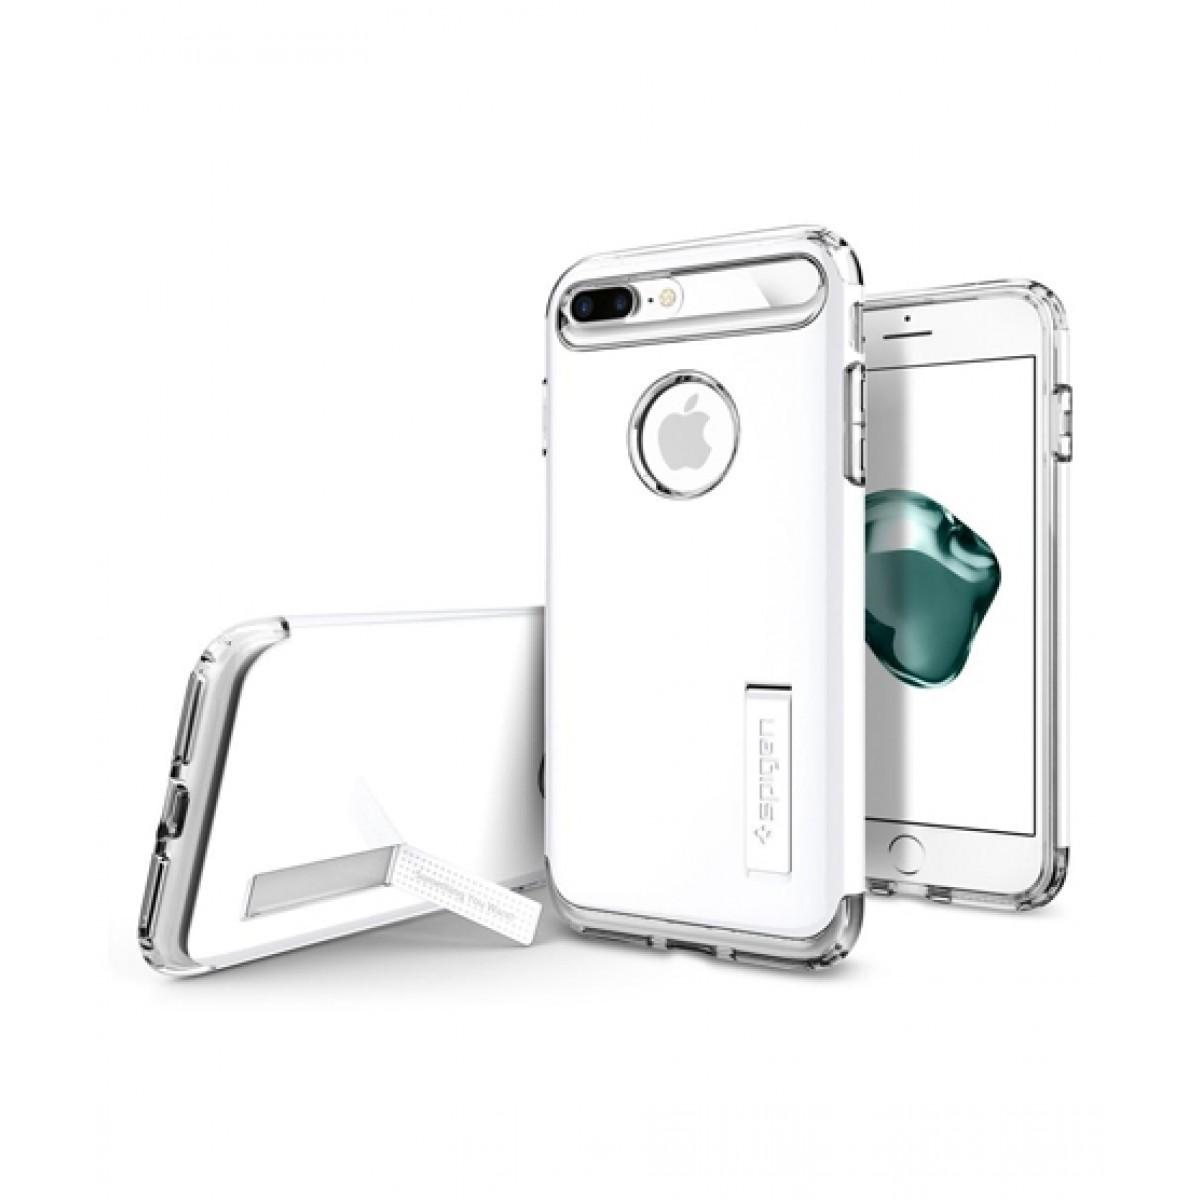 Spigen Slim Armor Jet White Case For iPhone 8 Plus